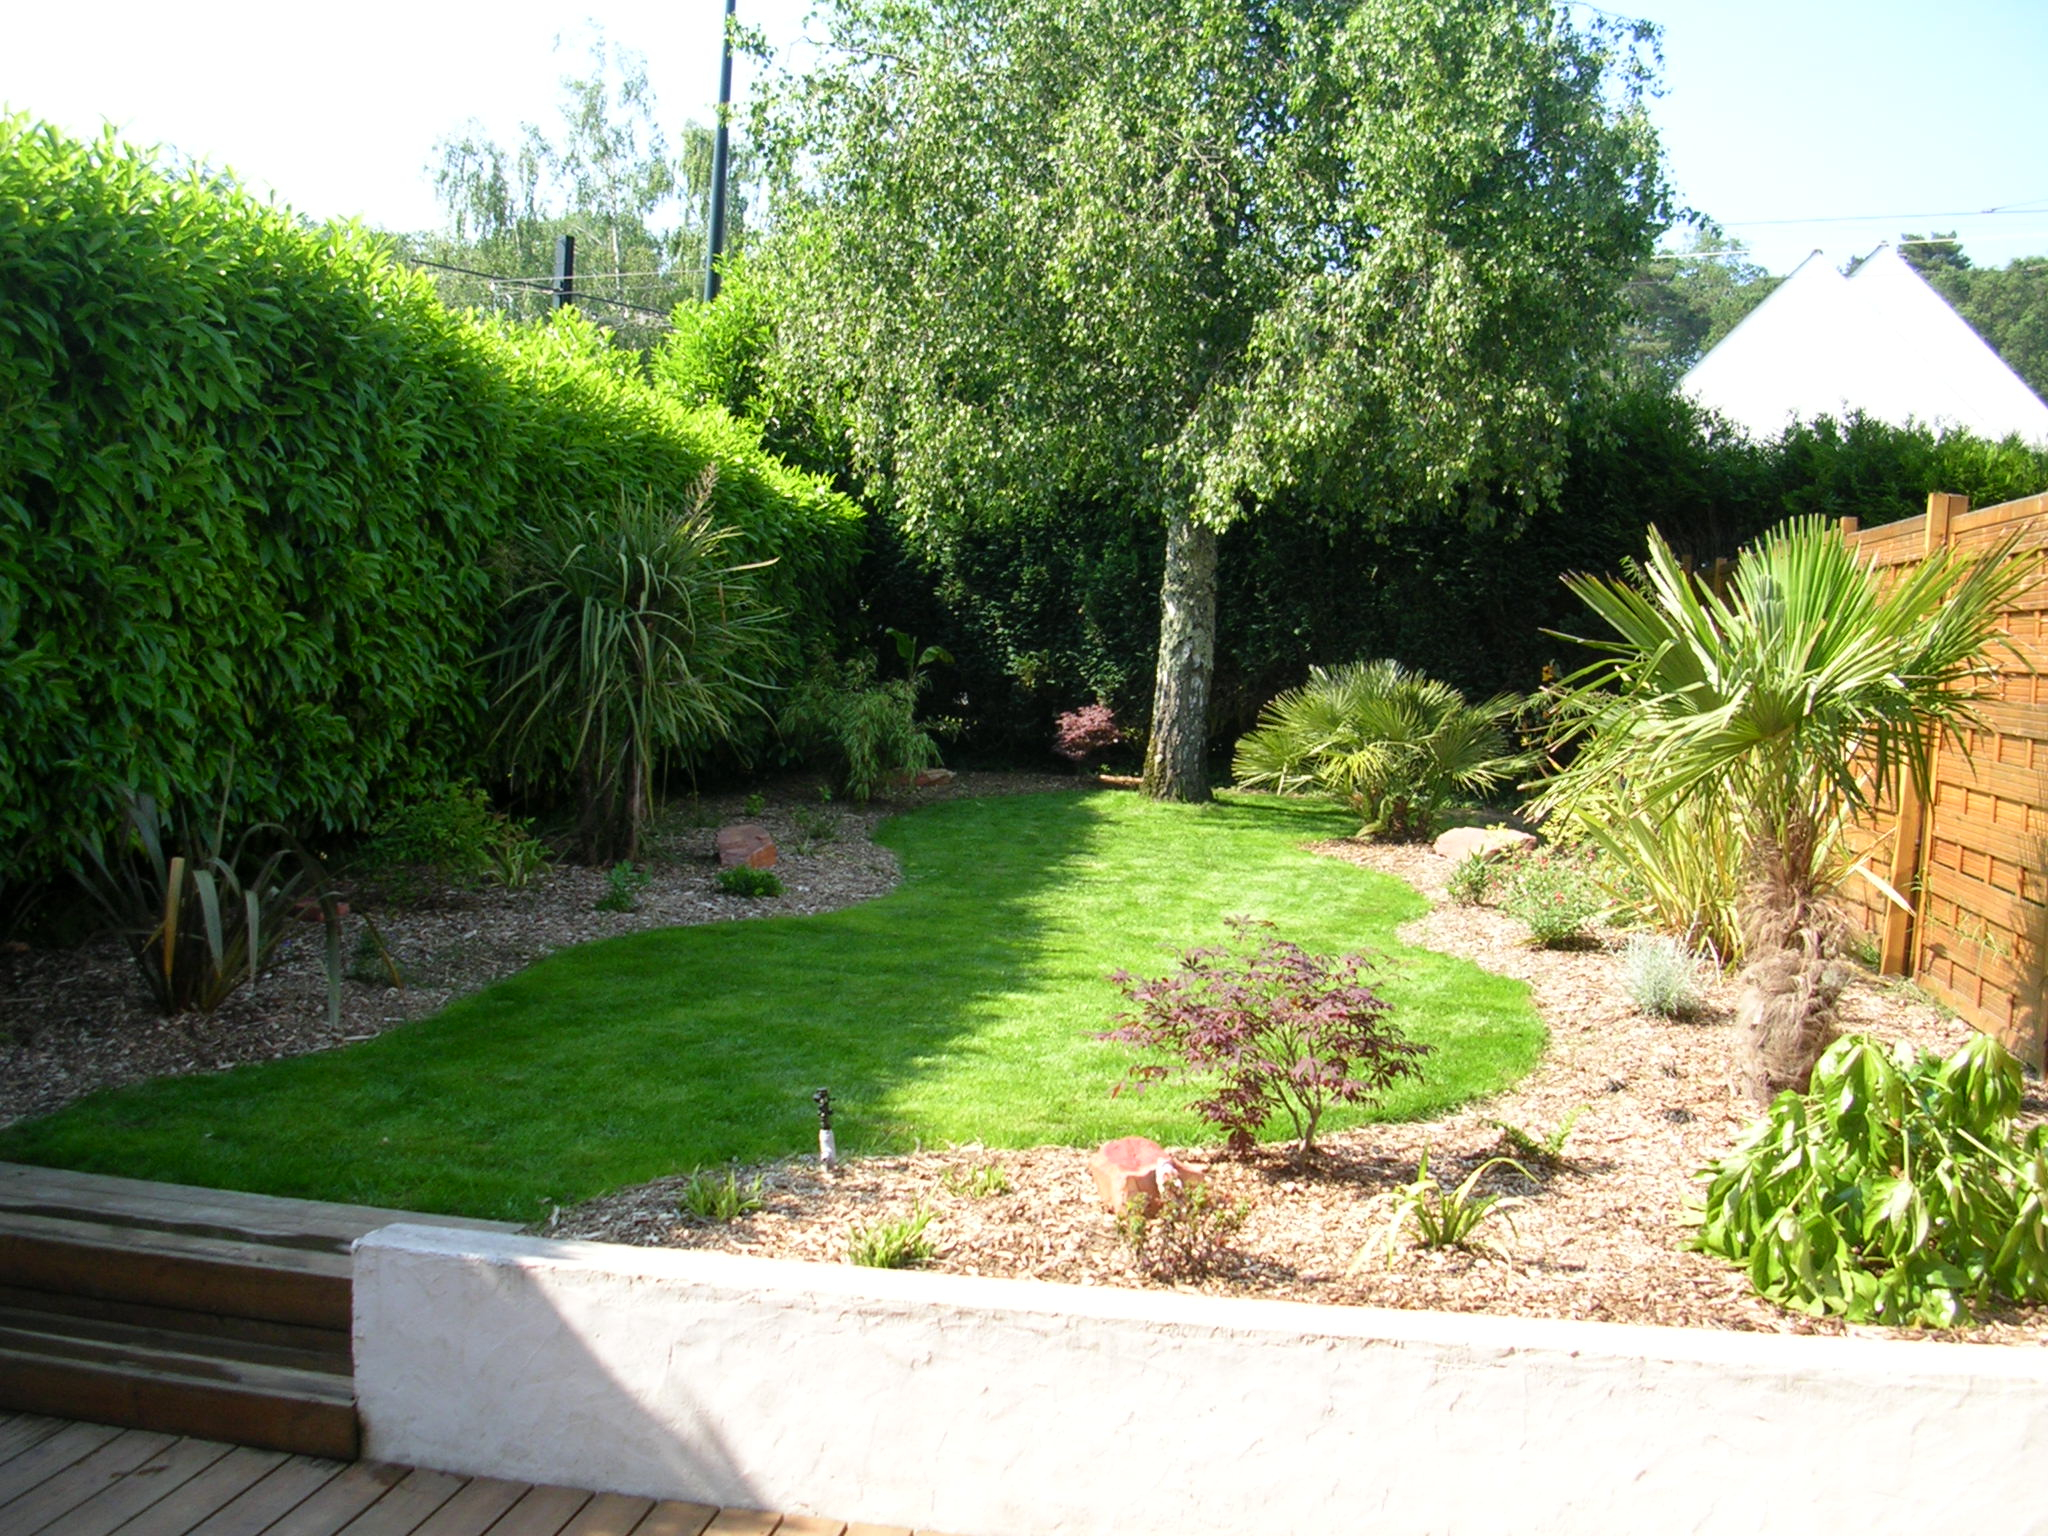 Conception De Jardins Scenery & Spring S De Jardins Paysages